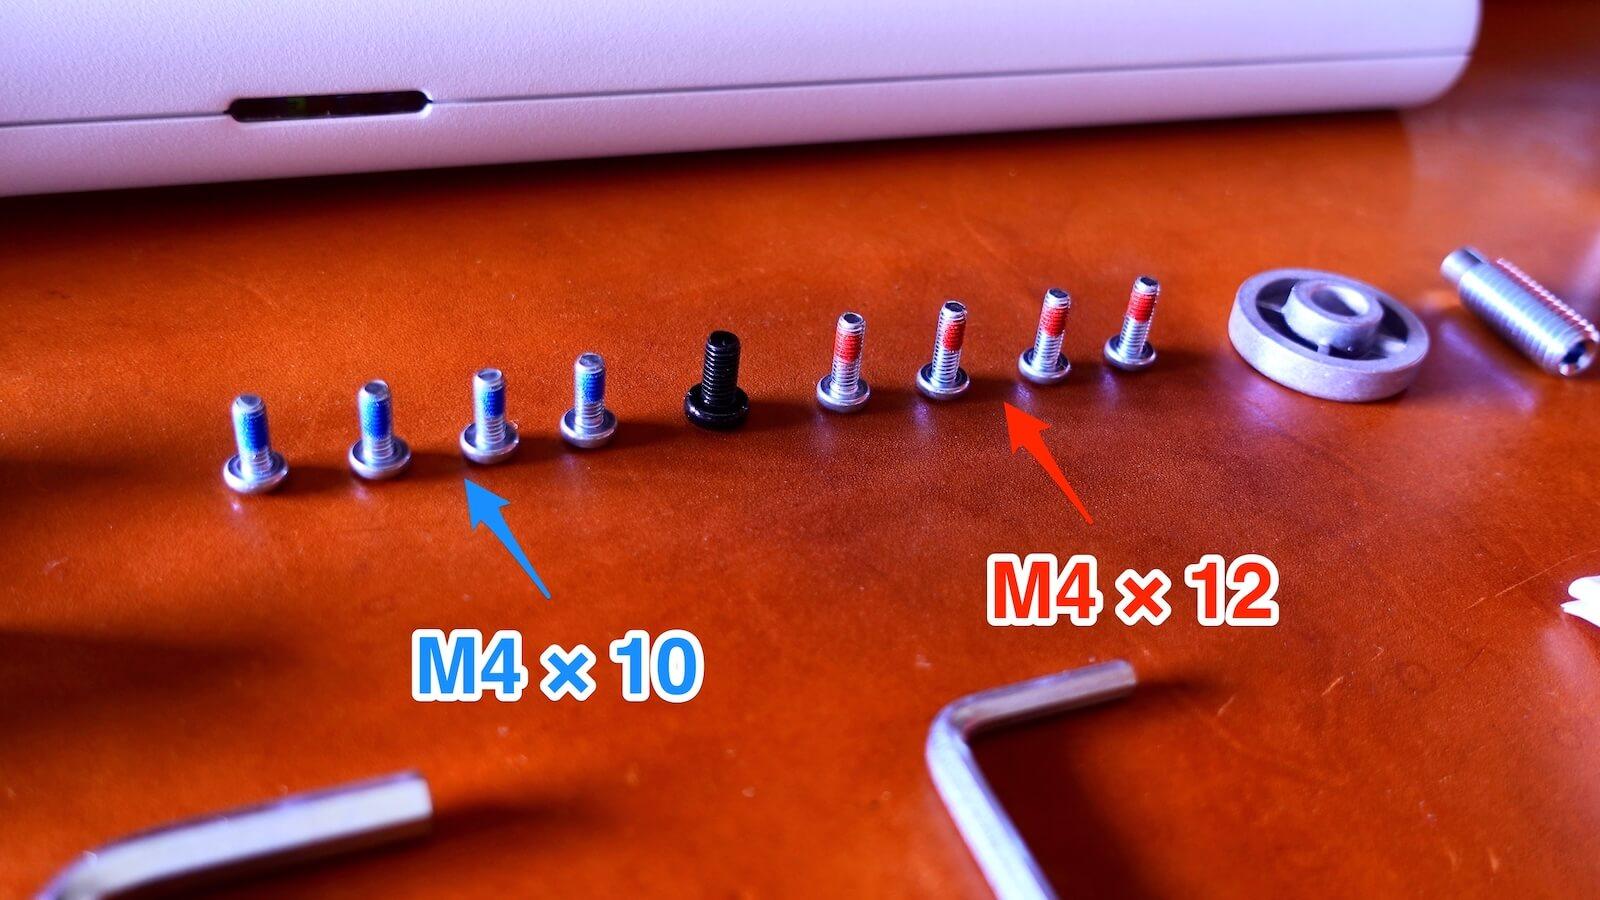 0HermanMiller FLO monitor arm with 2 screws